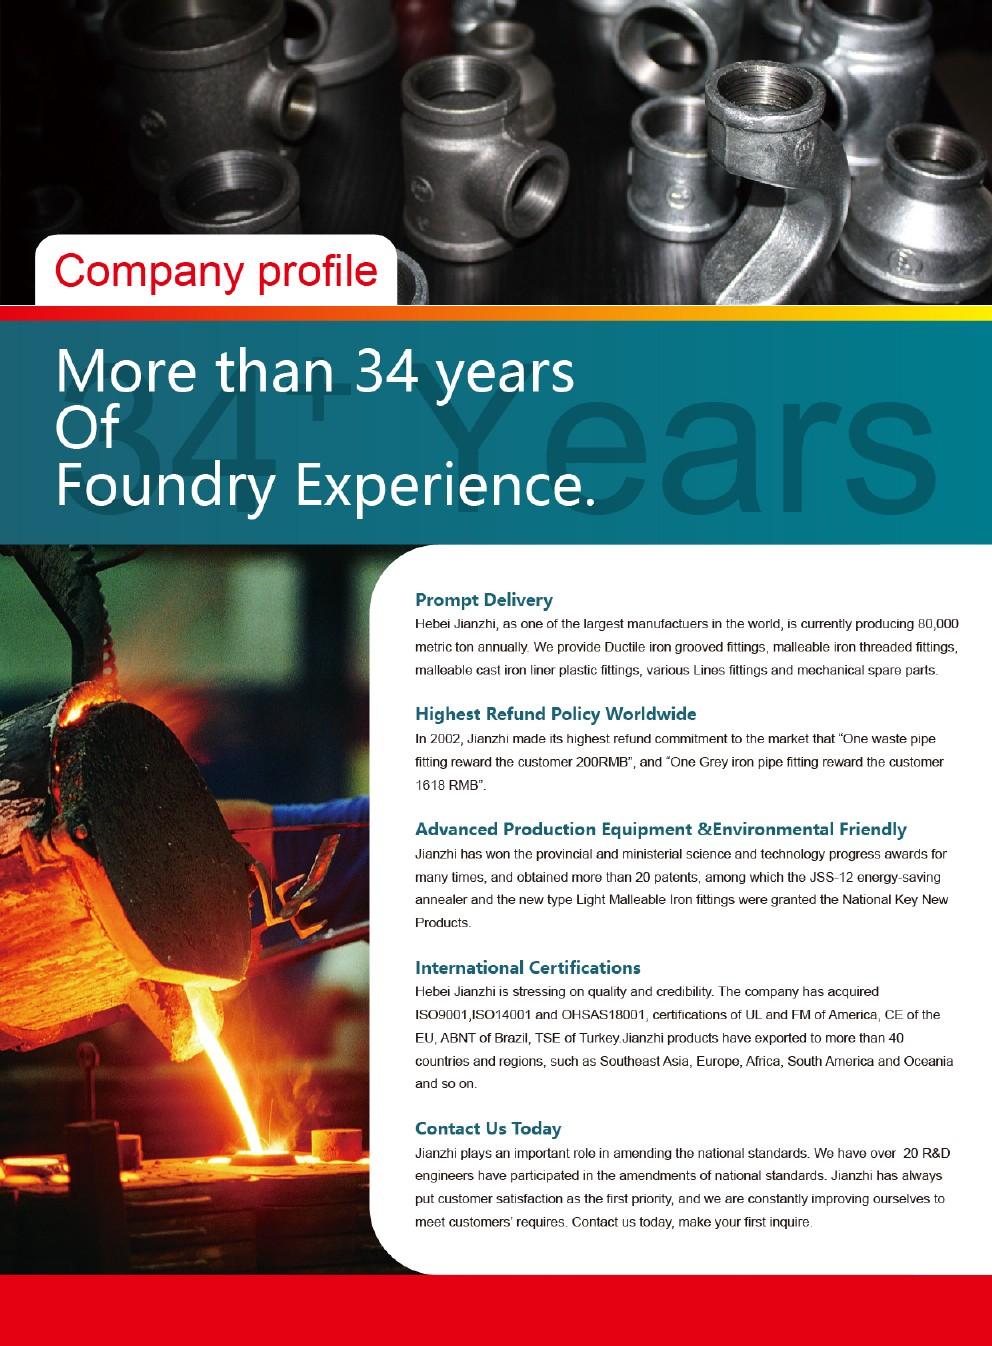 Jianzhi Company profile